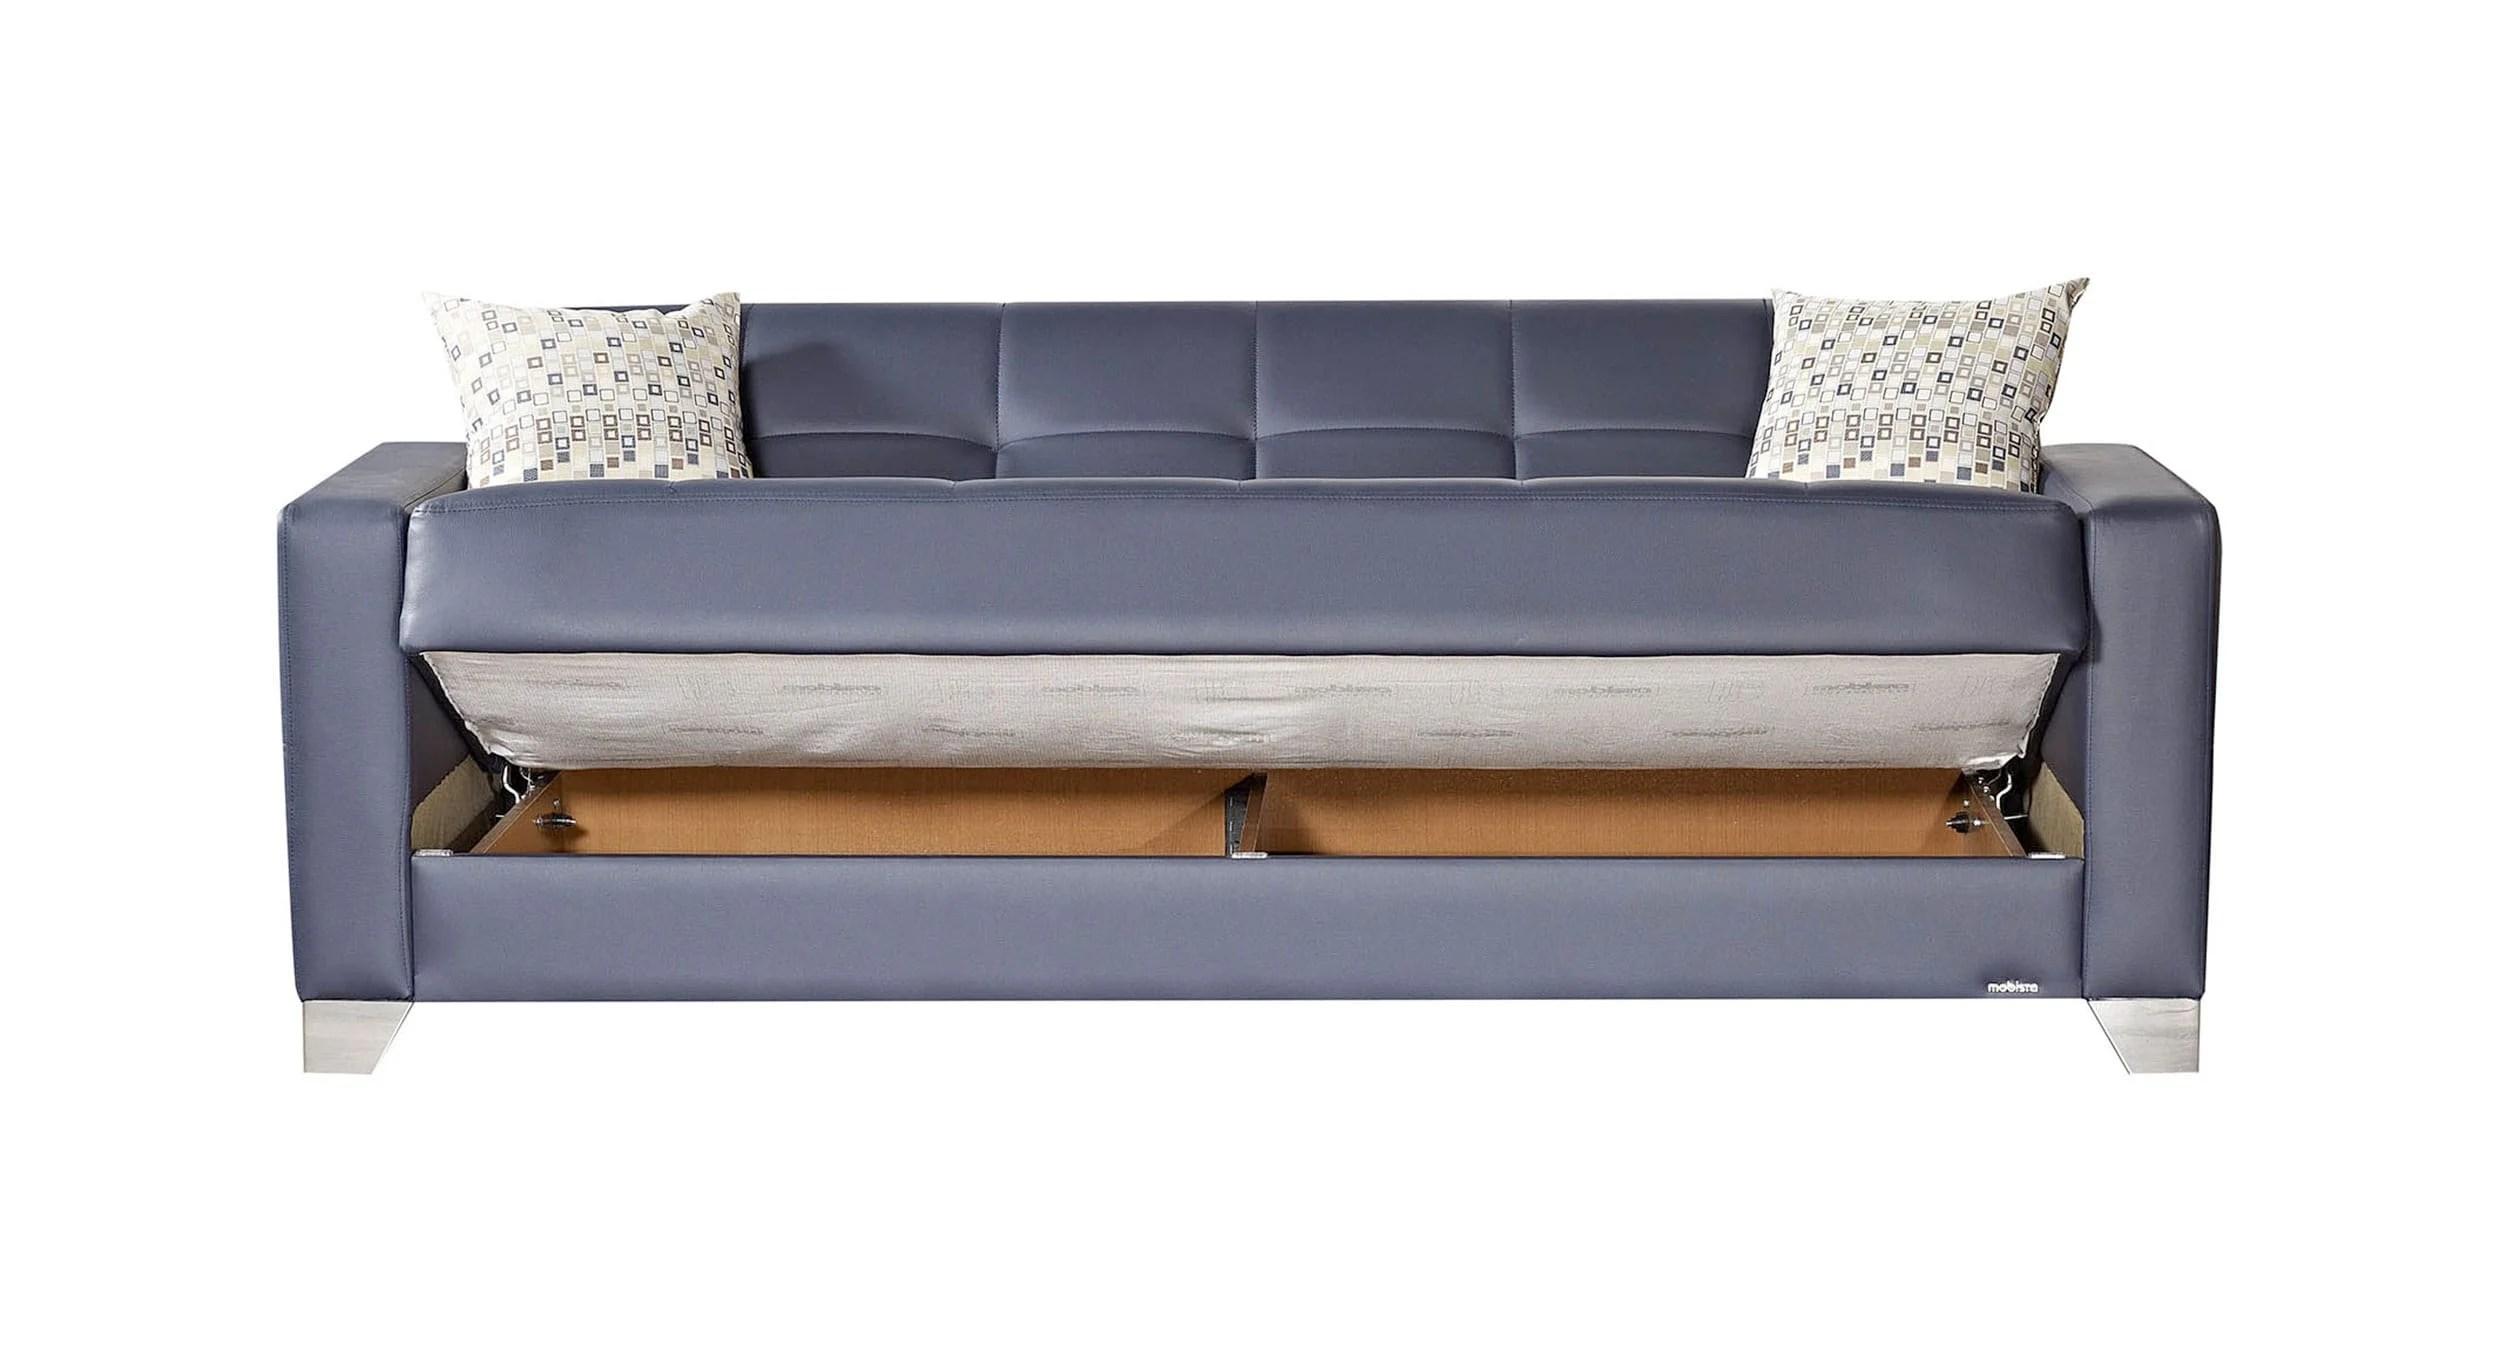 leatherette sofa durability diy slipcover for sectional viva italia prestige navy blue bed by mobista